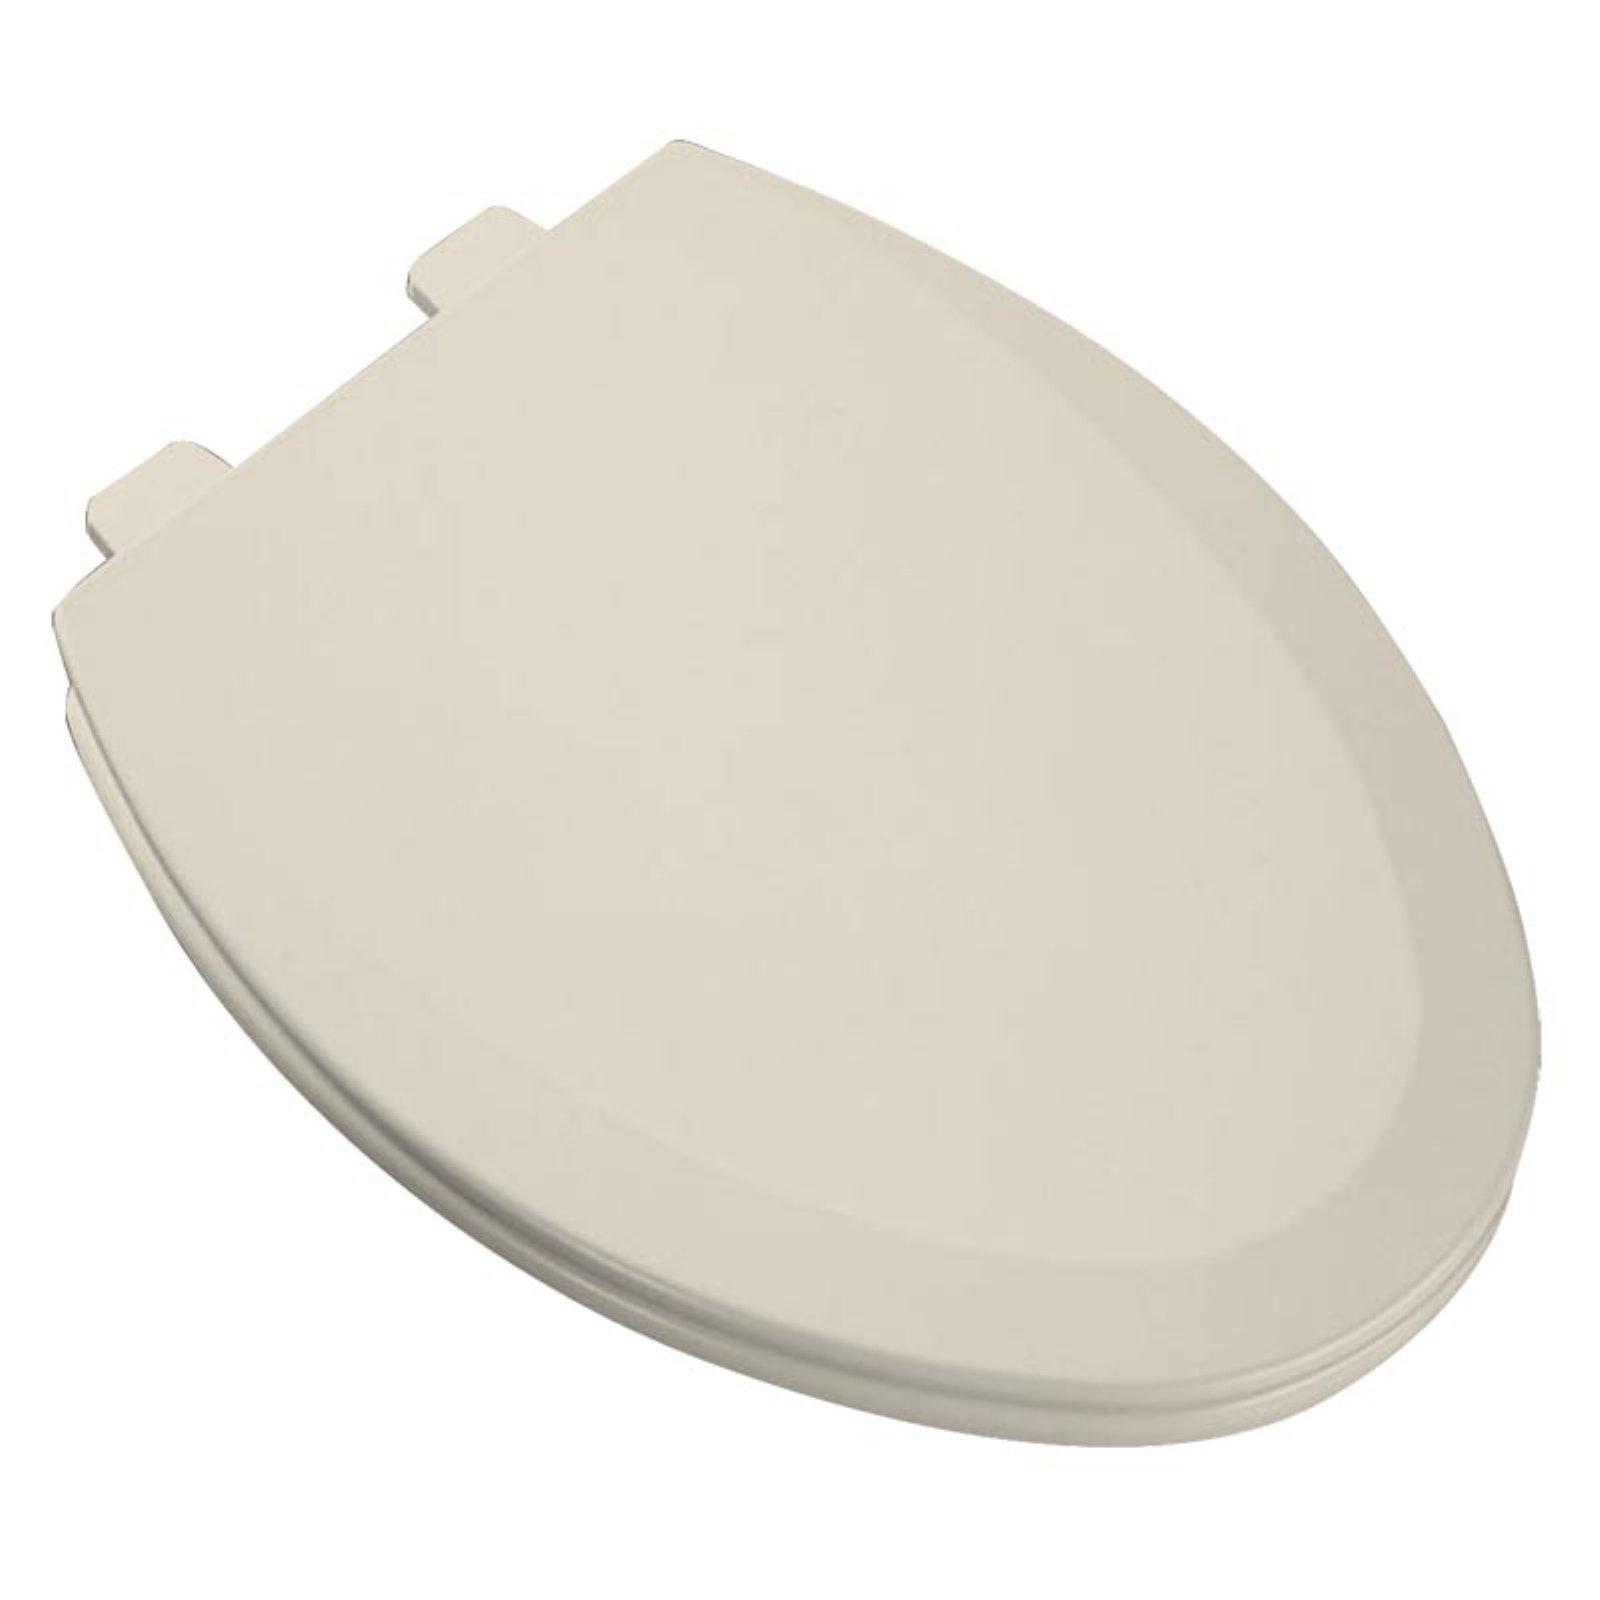 Bemis 1500ec elongated white wood toilet seat walmart nvjuhfo Gallery